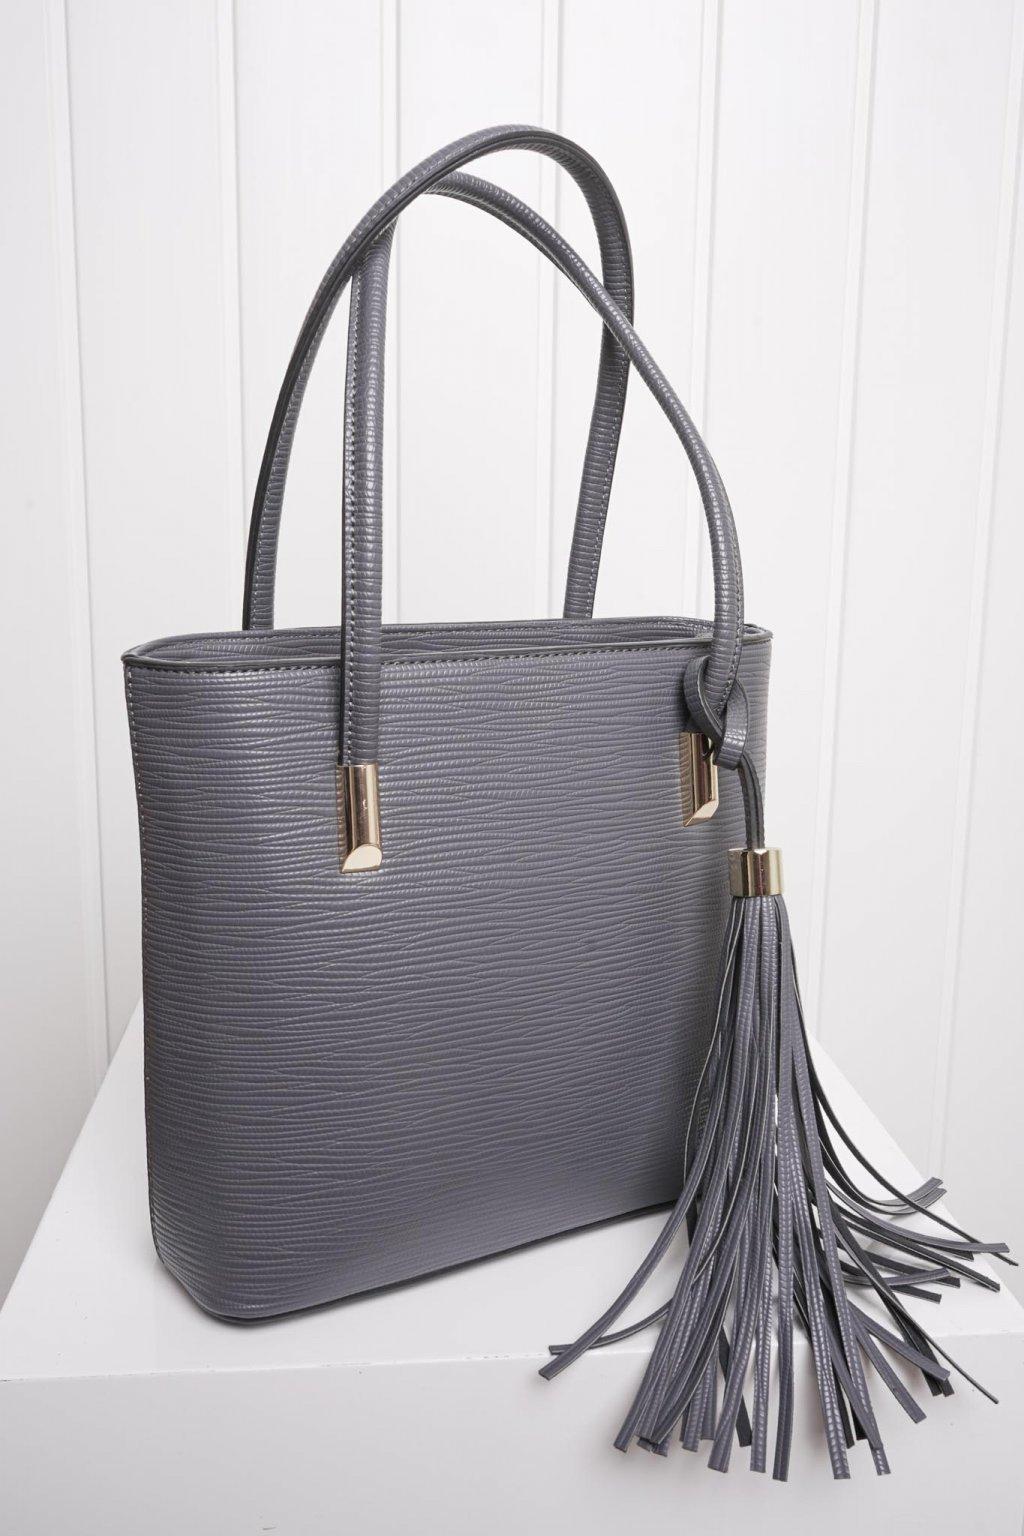 Kabelka, ruksak, dobrá cena, čierna kabelka, čierny ruksak, basic, kabelky, ruksaky 106